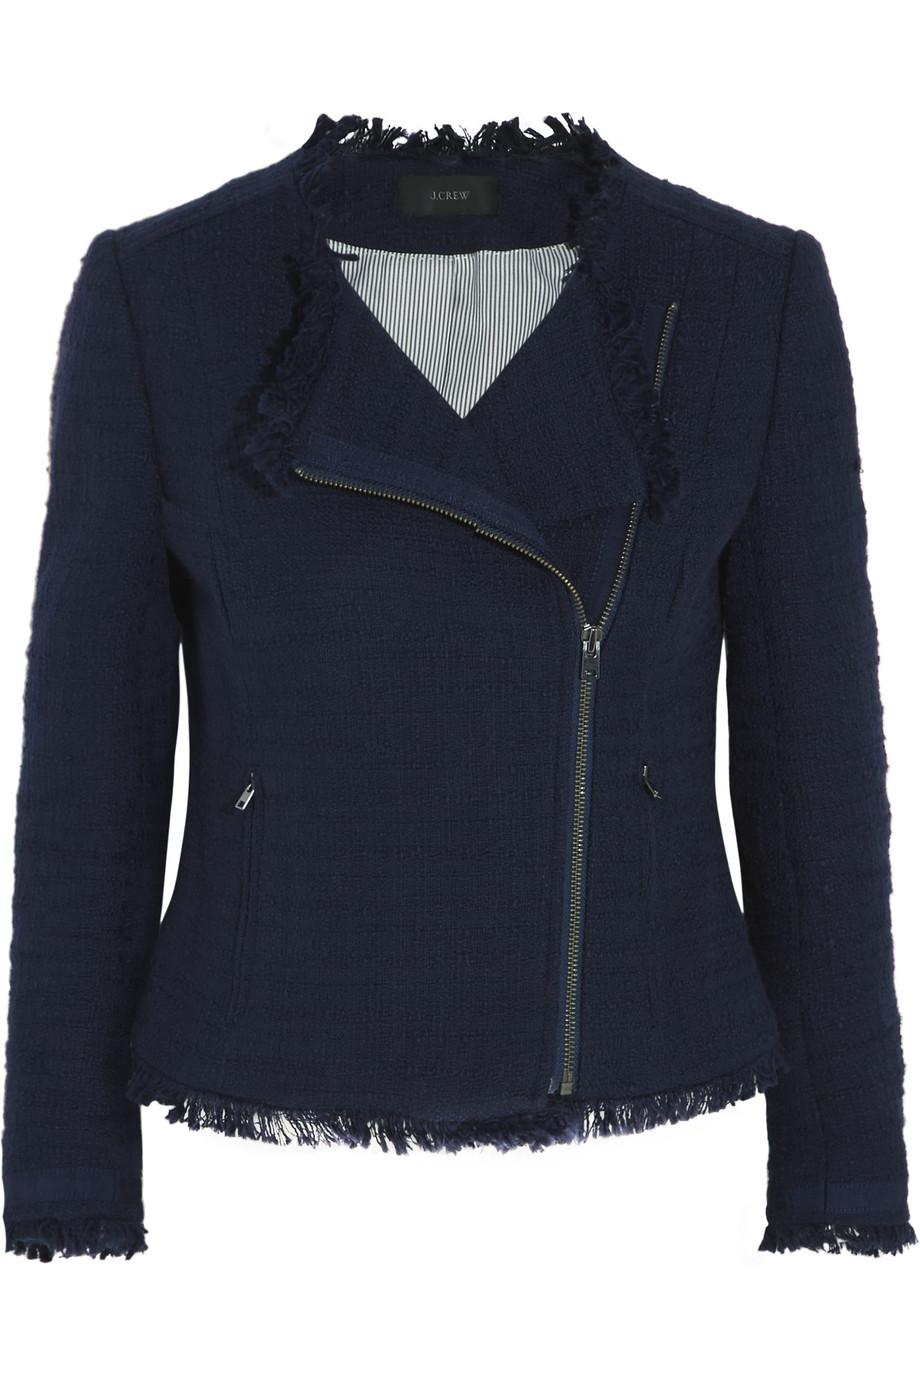 J.Crew Fringed Cotton-Blend Tweed Jacket, Navy, Women's, Size: 0